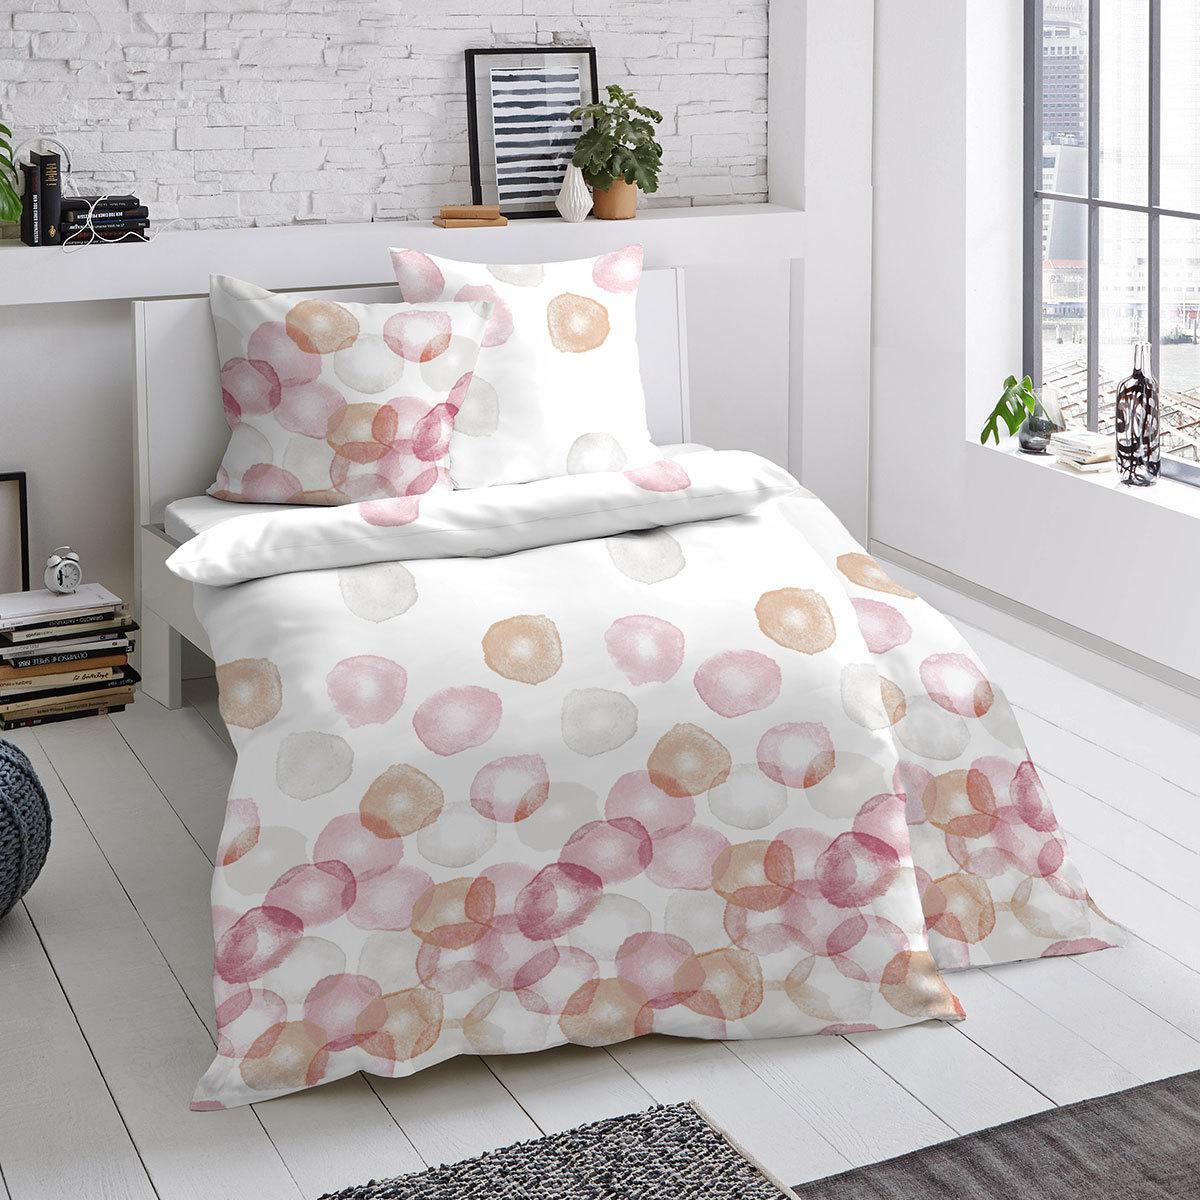 dormisette mako satin bettw sche denver g nstig online kaufen bei bettwaren shop. Black Bedroom Furniture Sets. Home Design Ideas